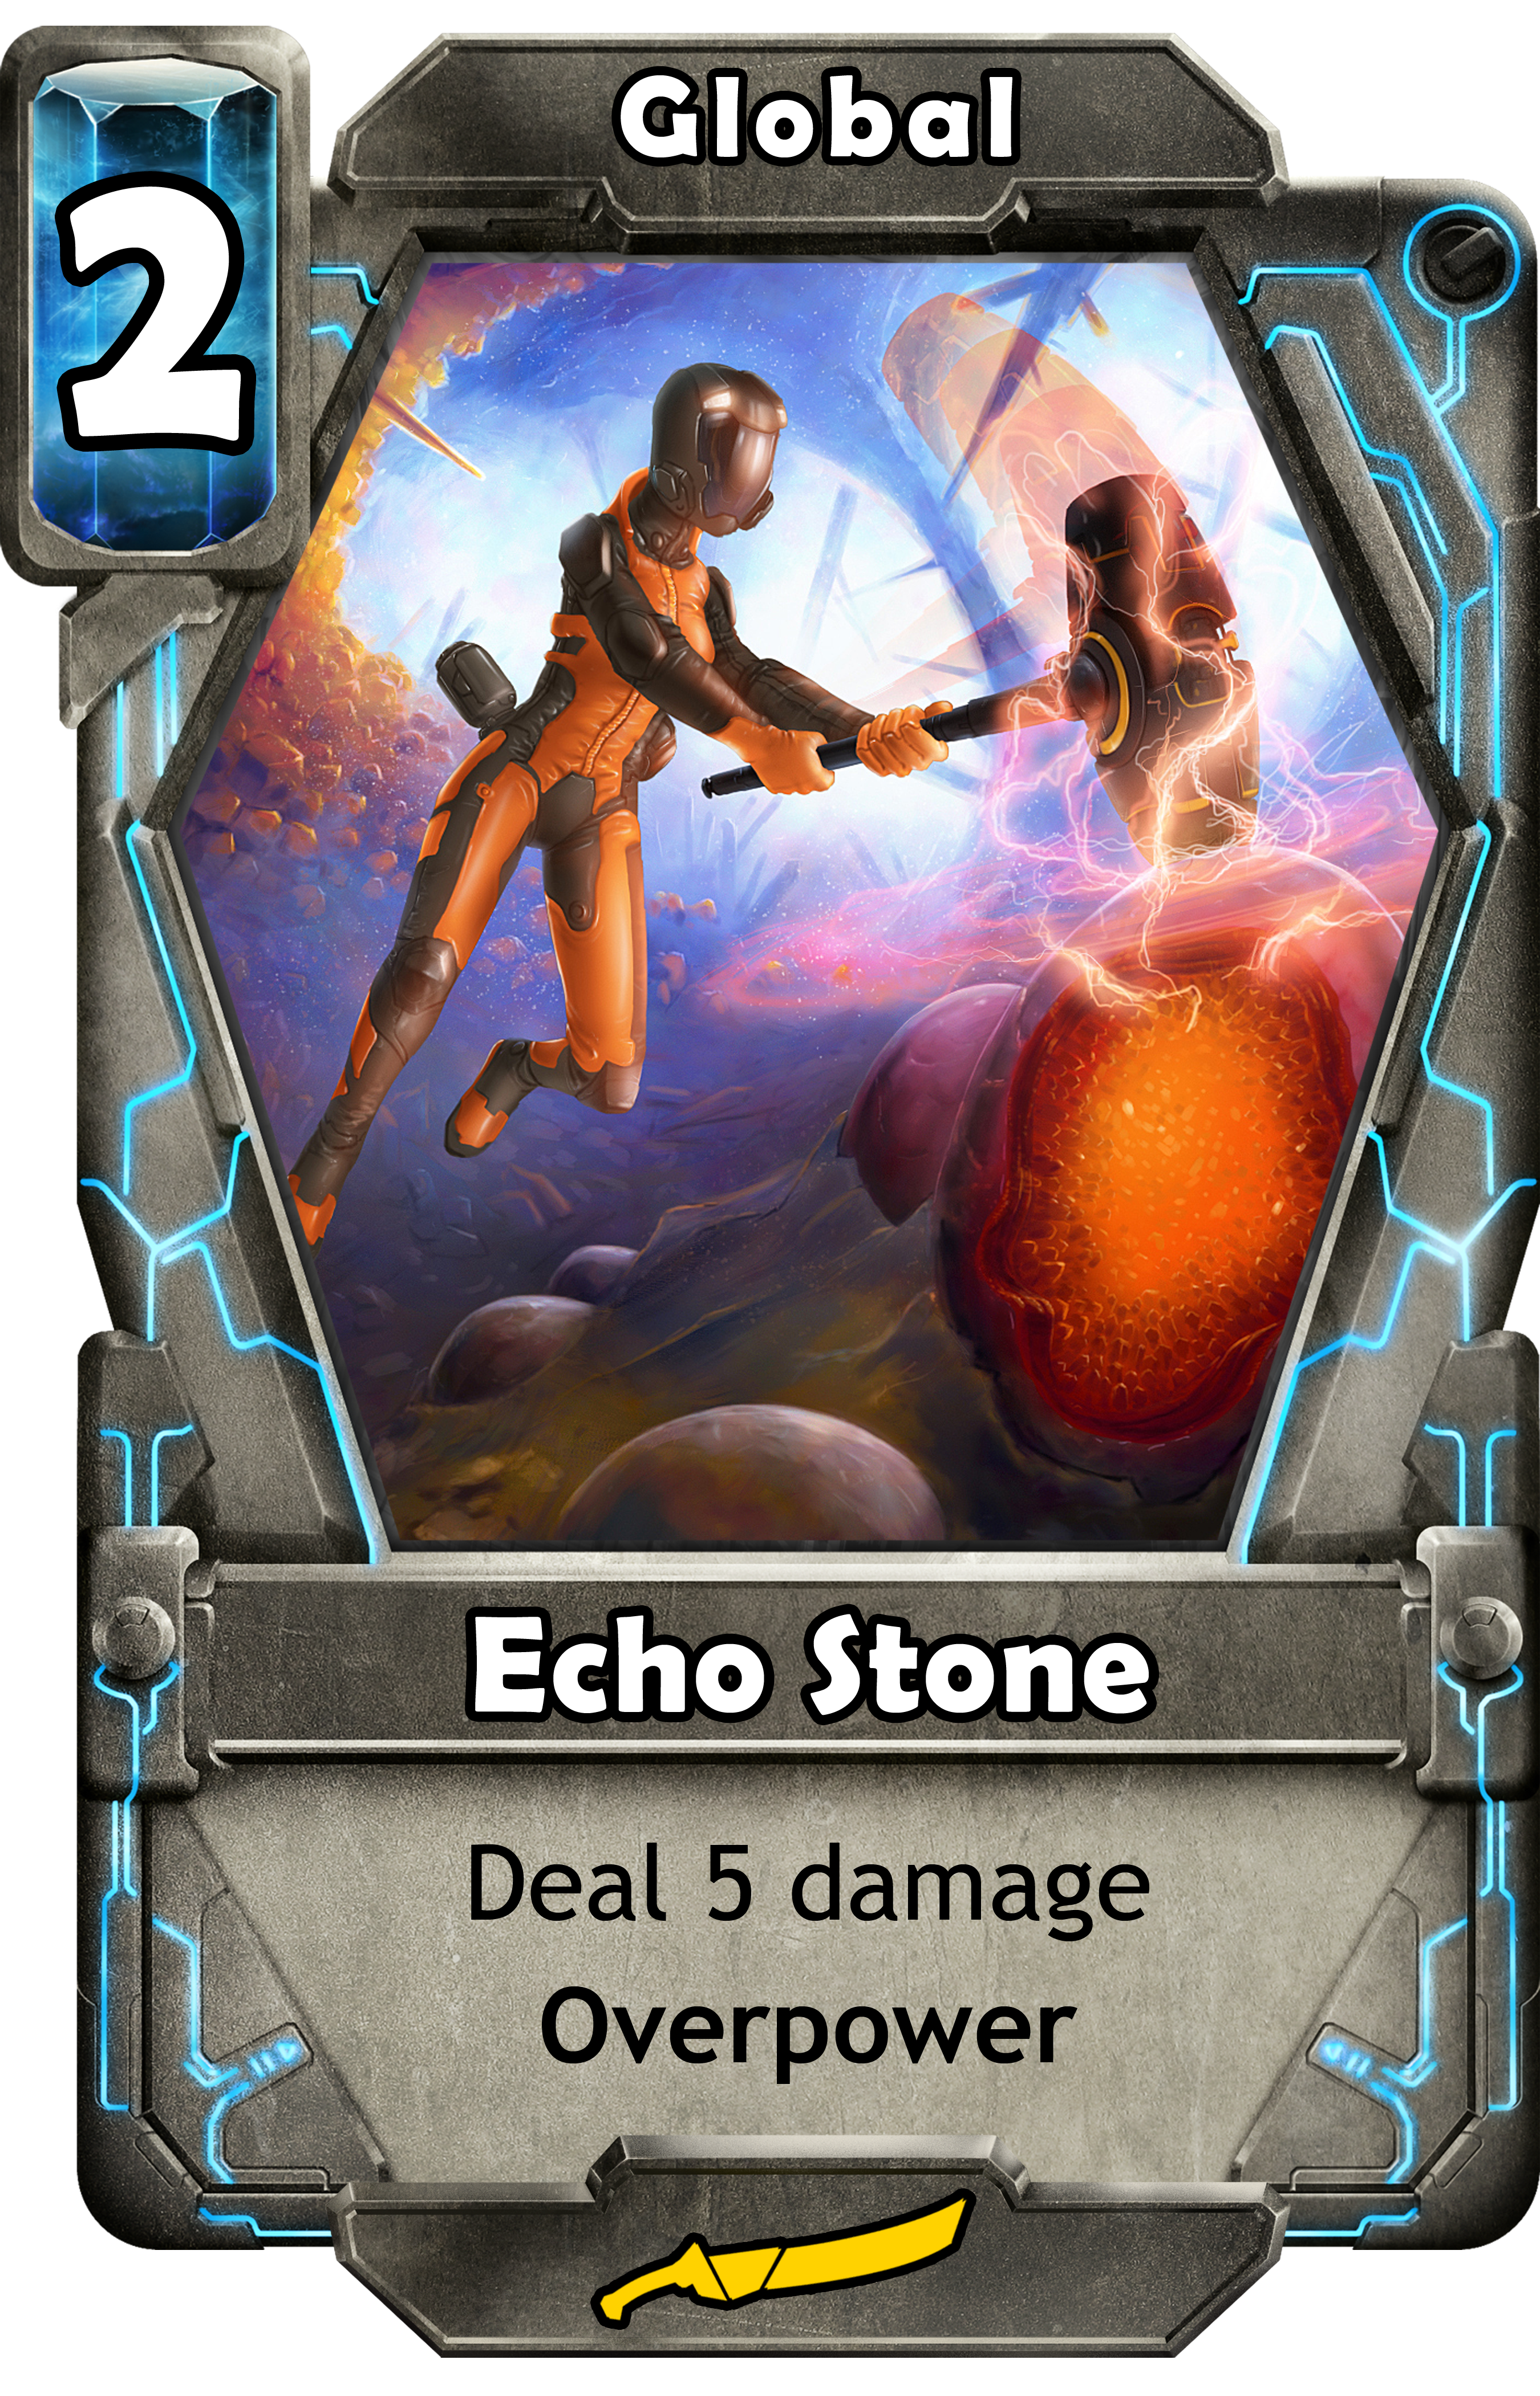 Echo Stone